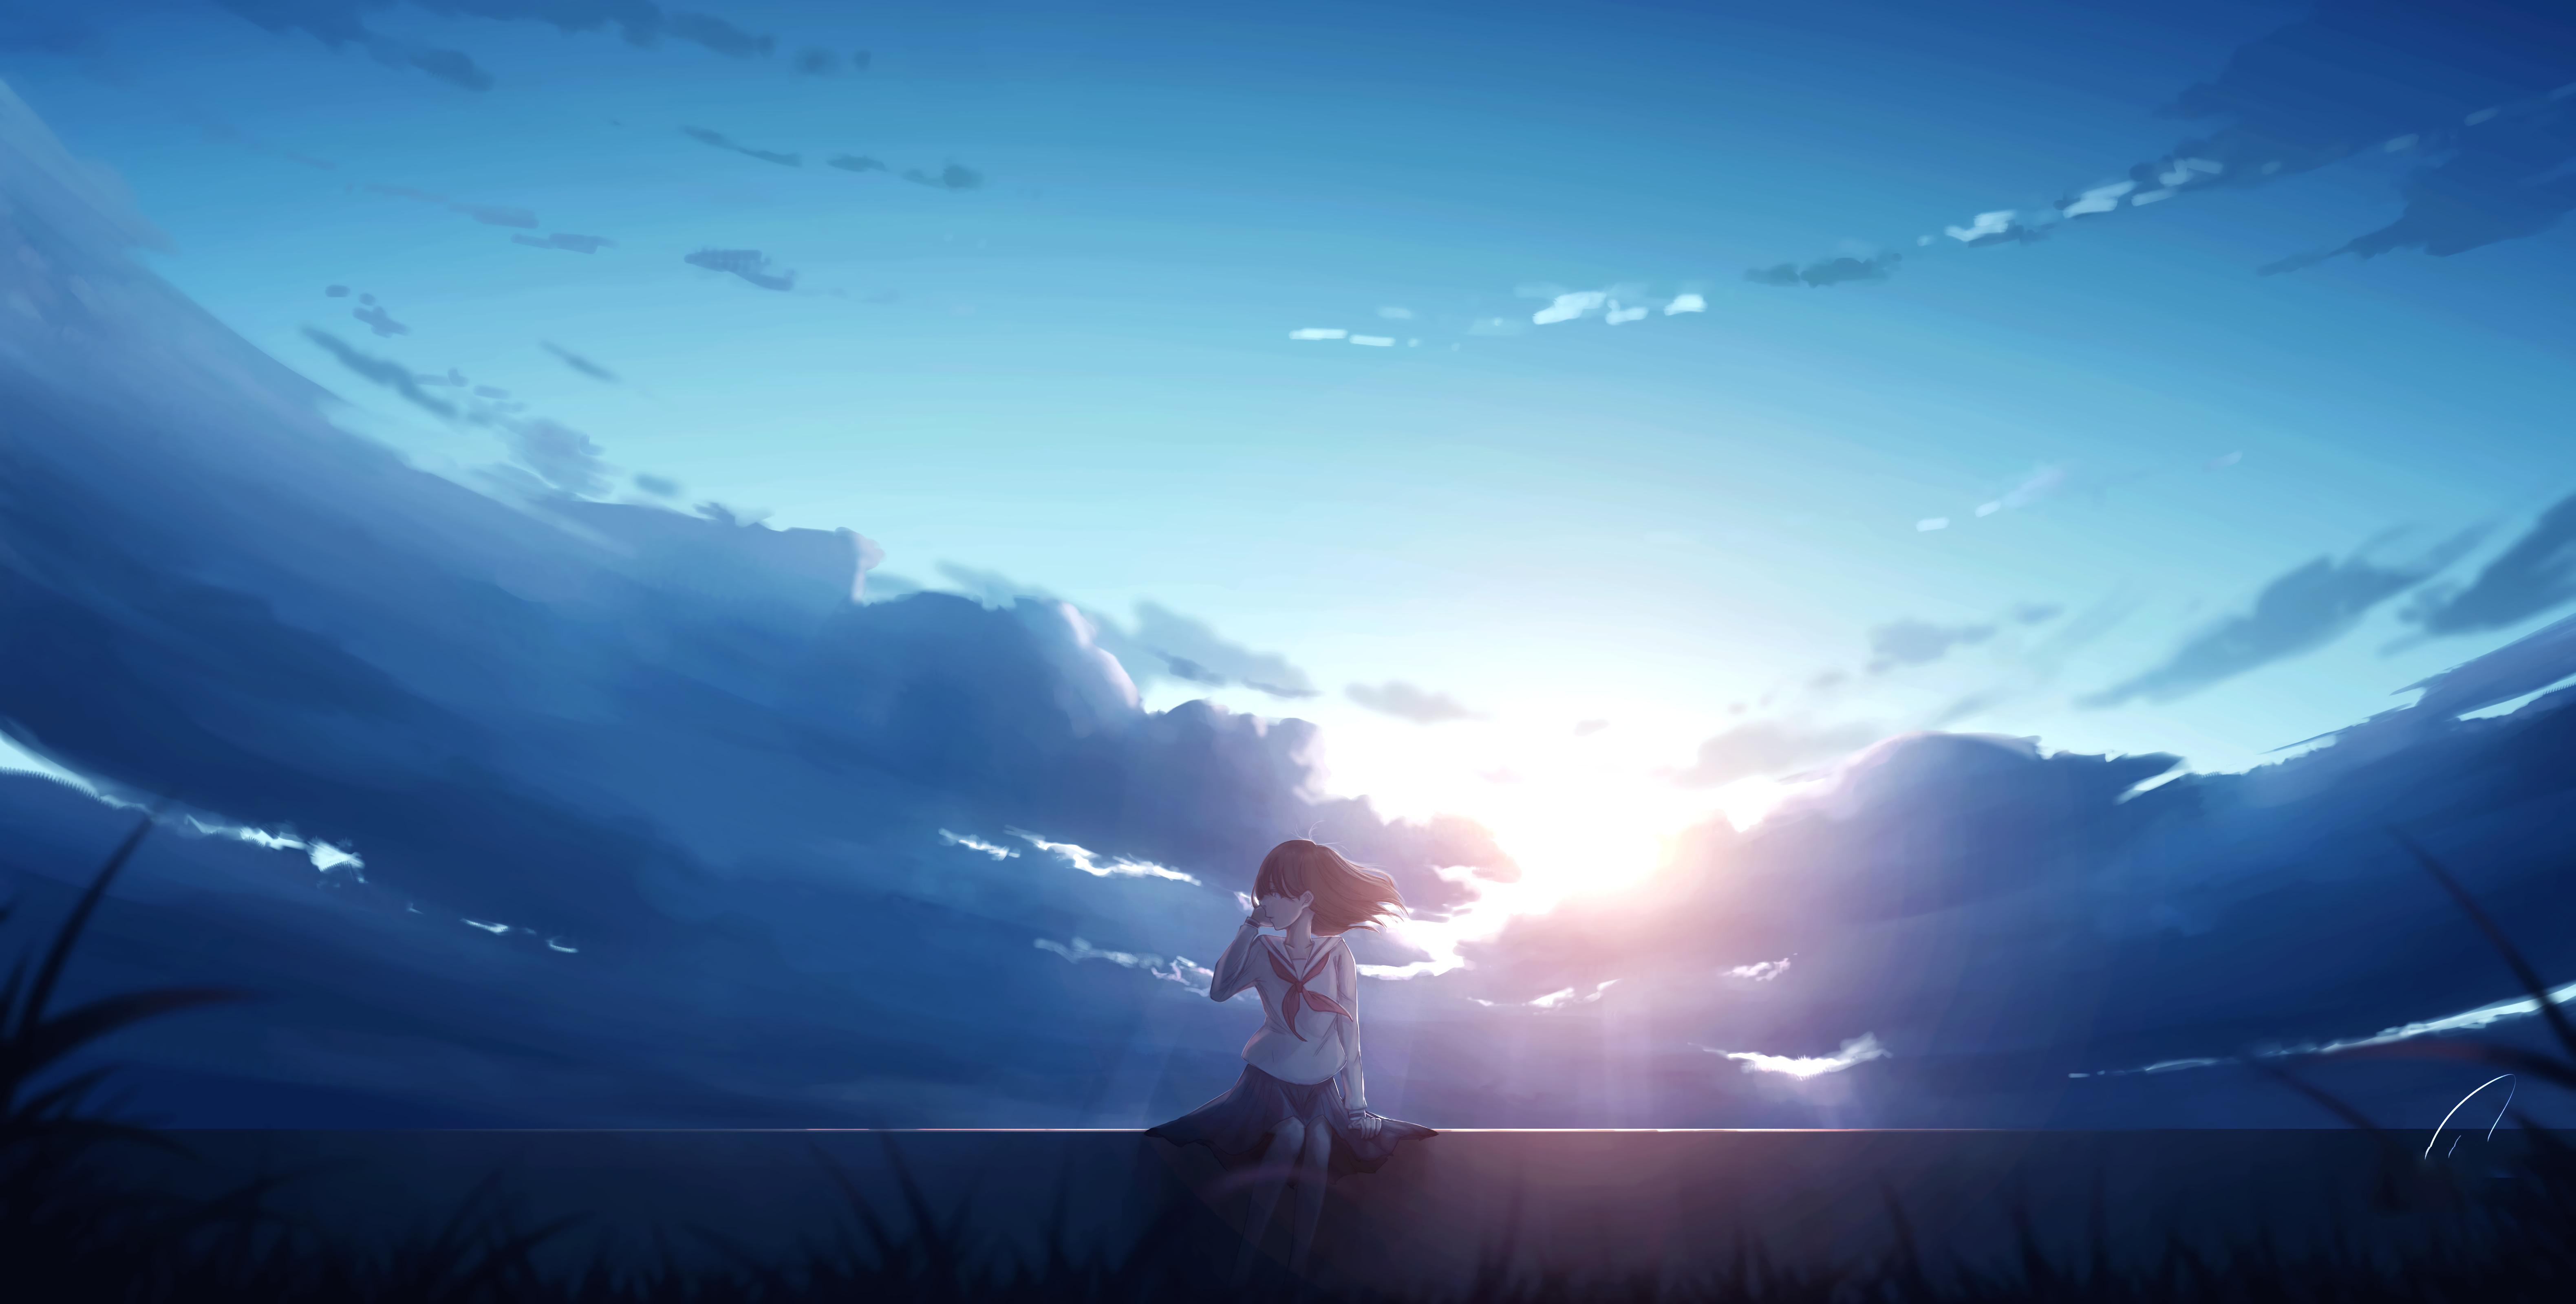 Anime Girl Alone Sitting 4k Anime Girl Alone Sitting 4k ...